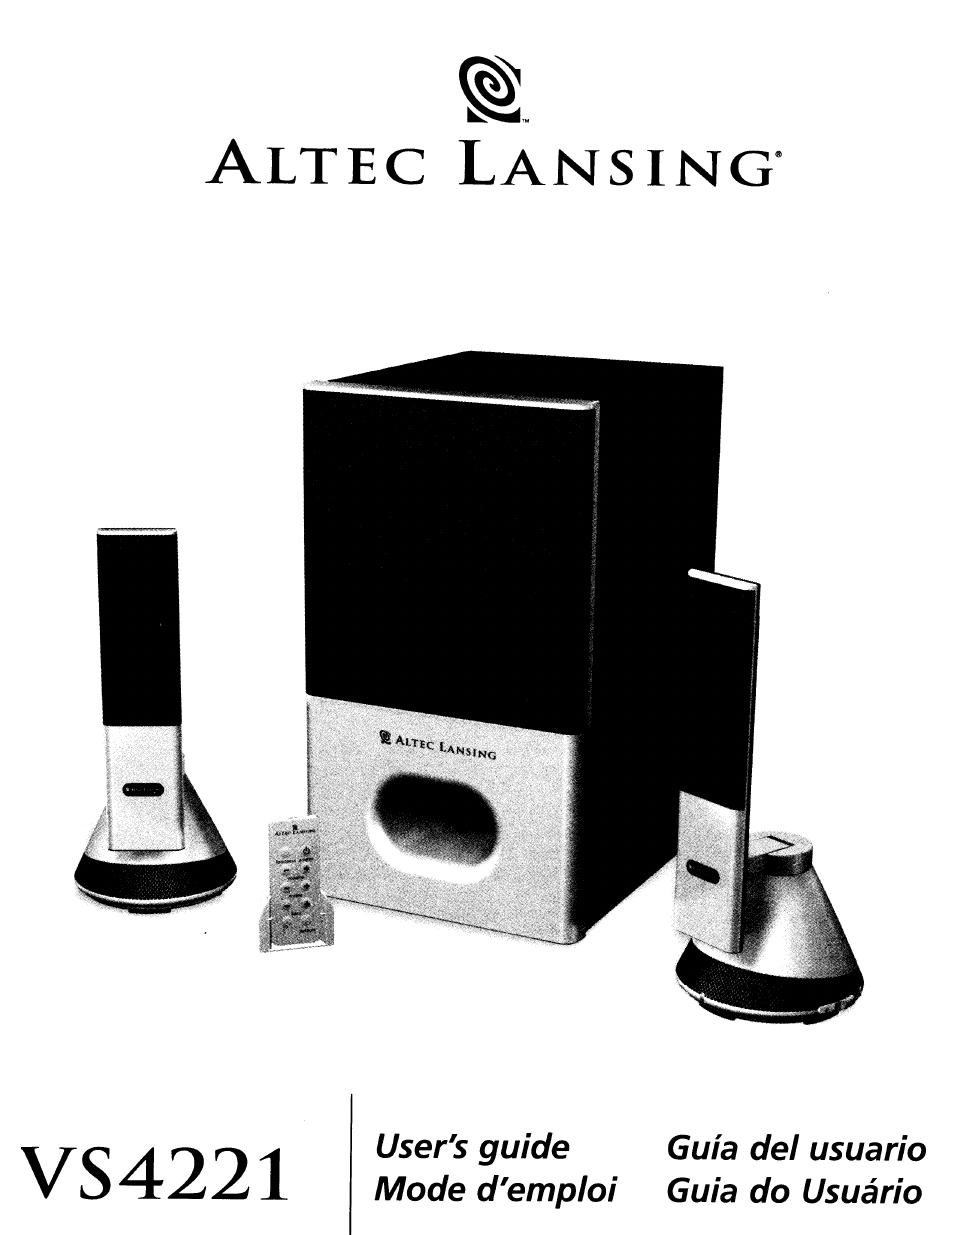 altec lansing vs4221 user manual 9 pages rh manualsdir com Altec Lansing VS4221 Connection Diagrams Altec Lansing VS4221 Connection Diagrams